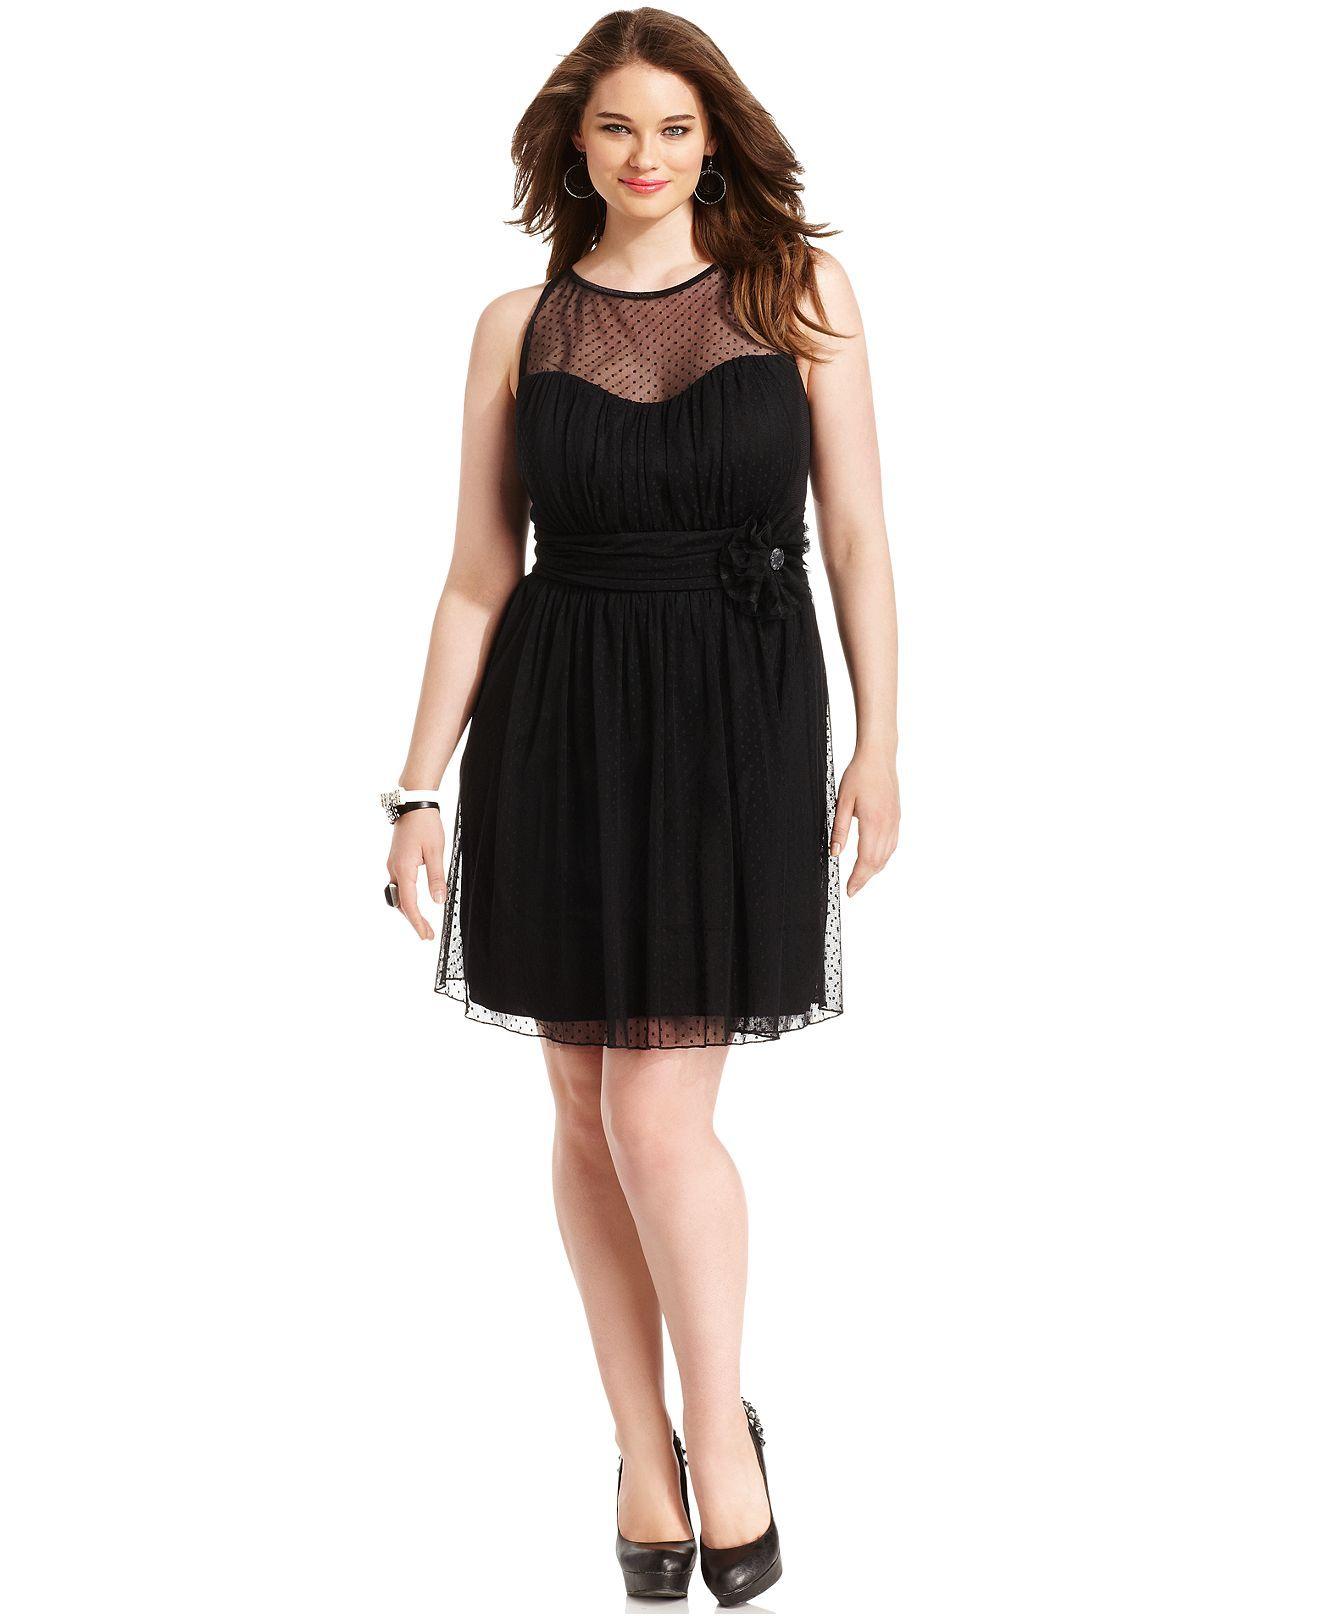 5867ddd10 Macys Junior Plus Homecoming Dresses – DACC